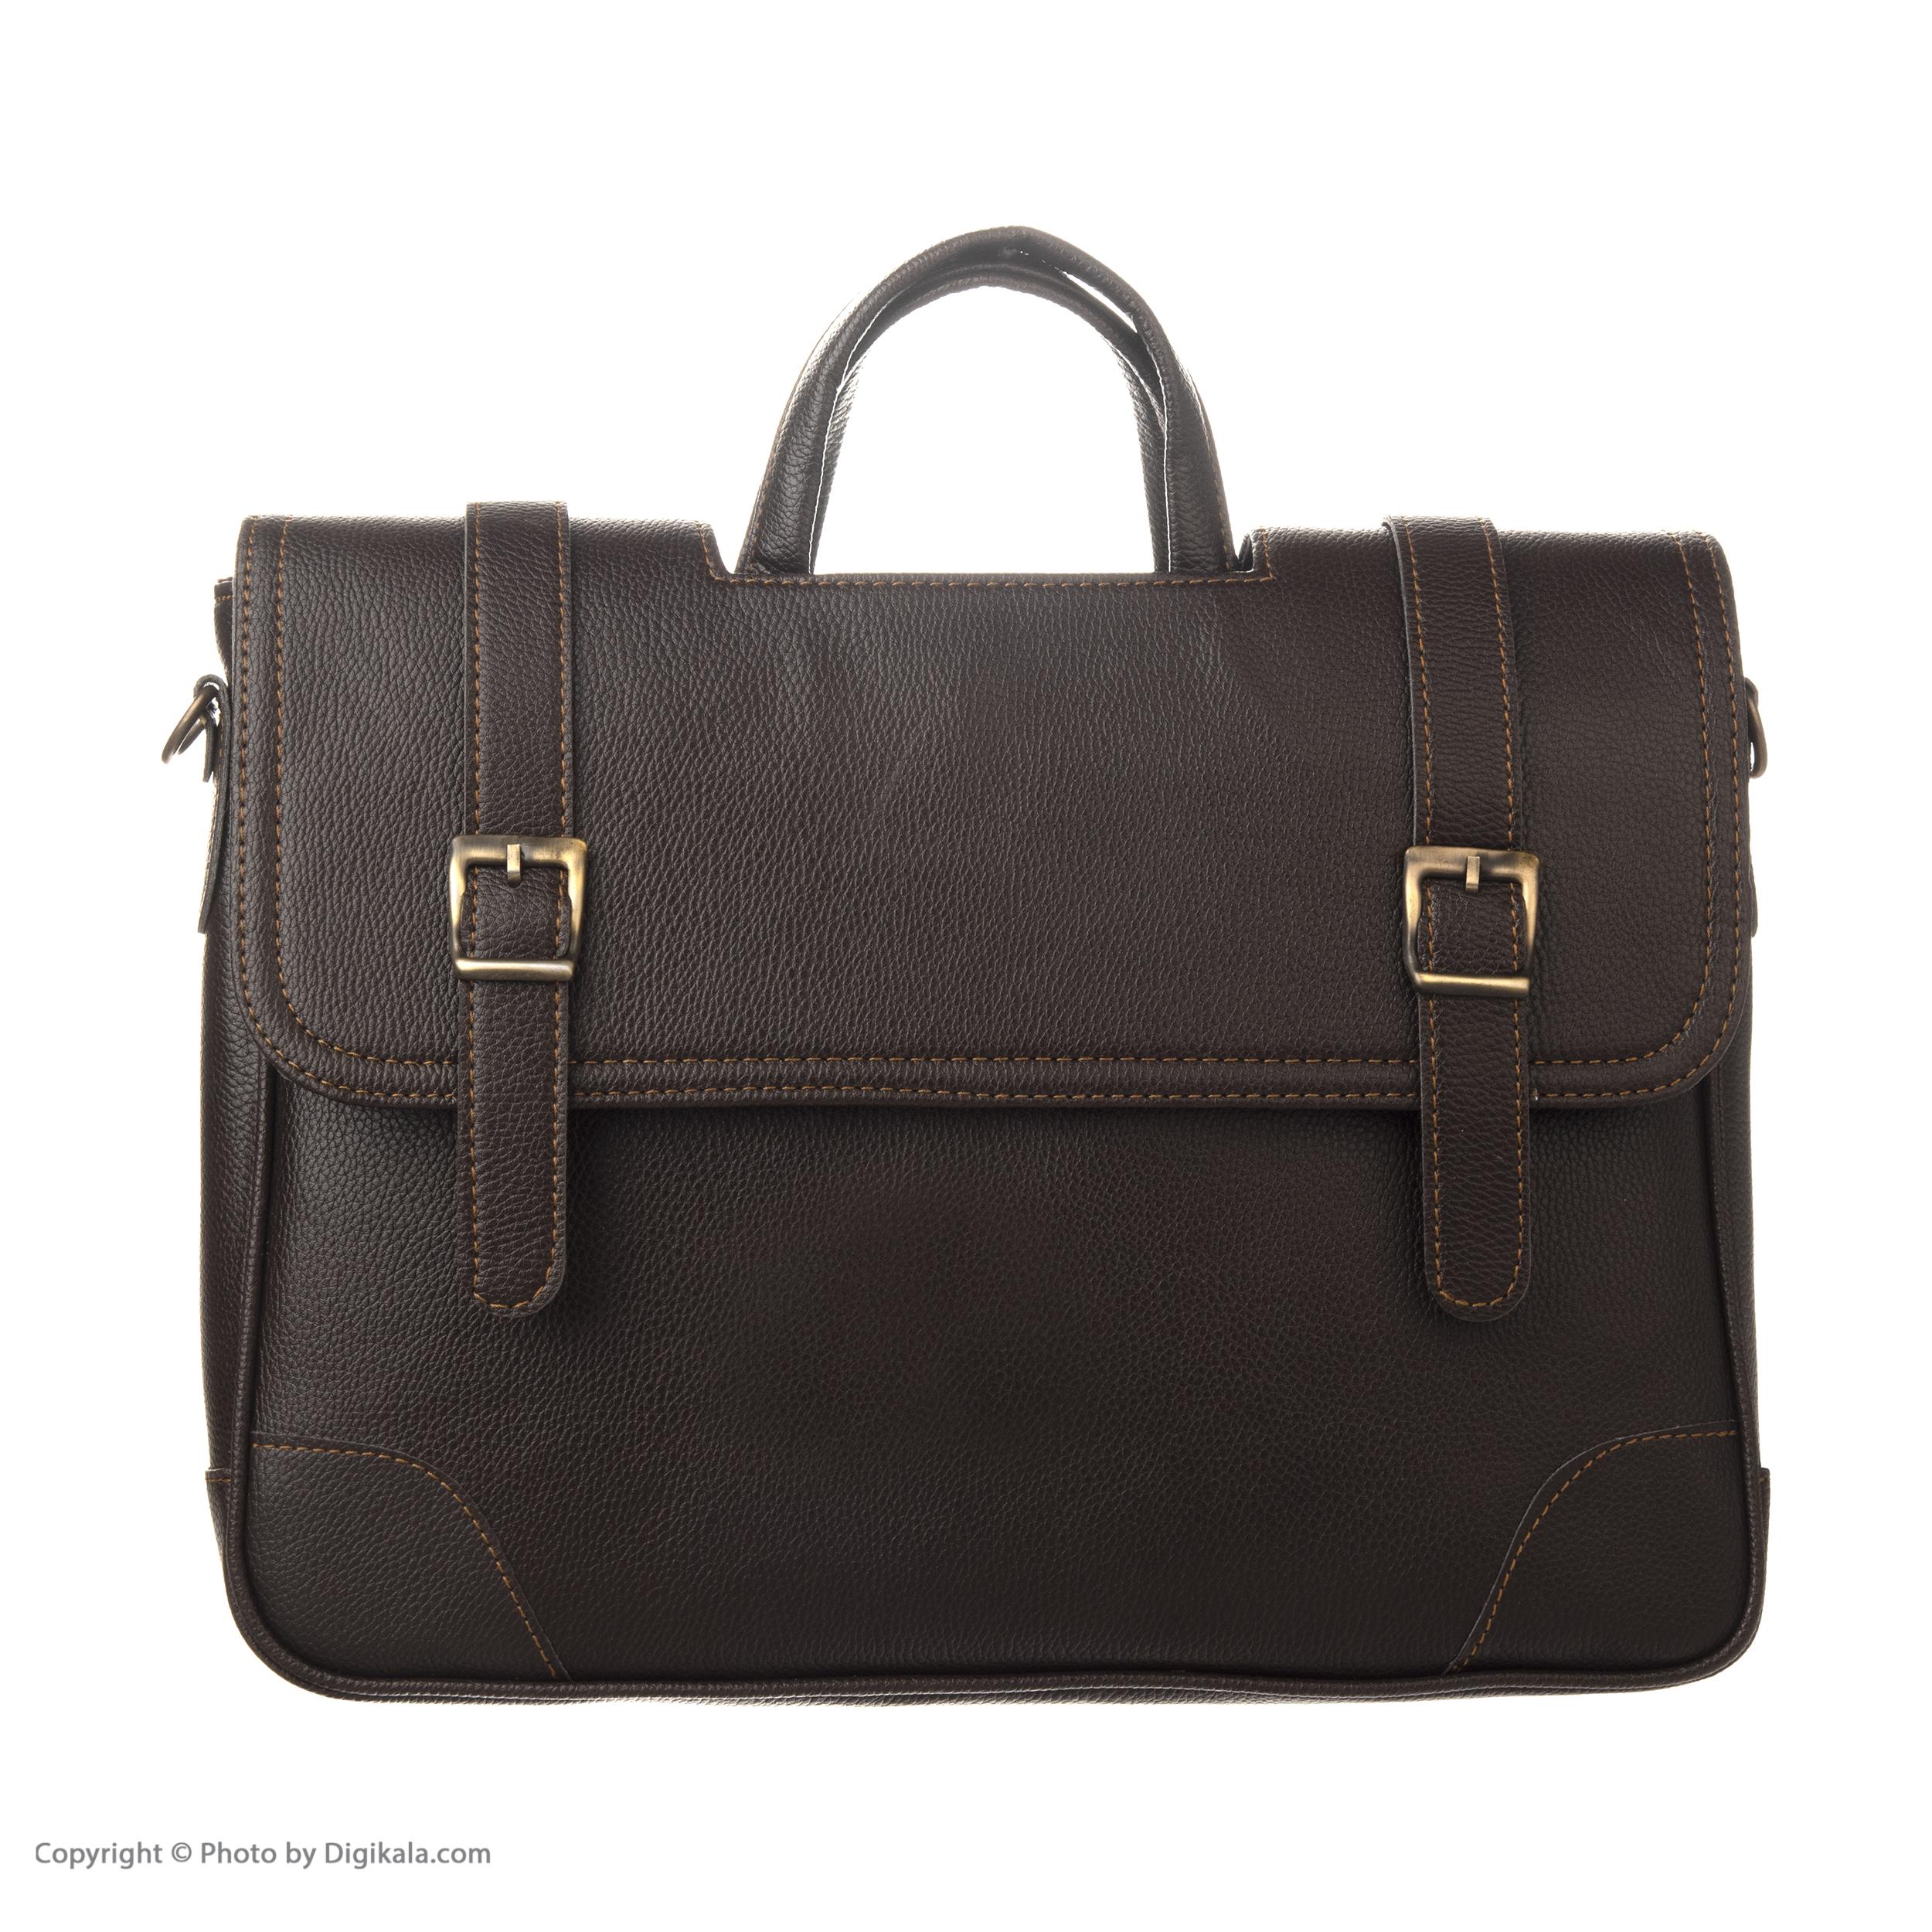 کیف اداری مردانه دلنیا مدل E11801